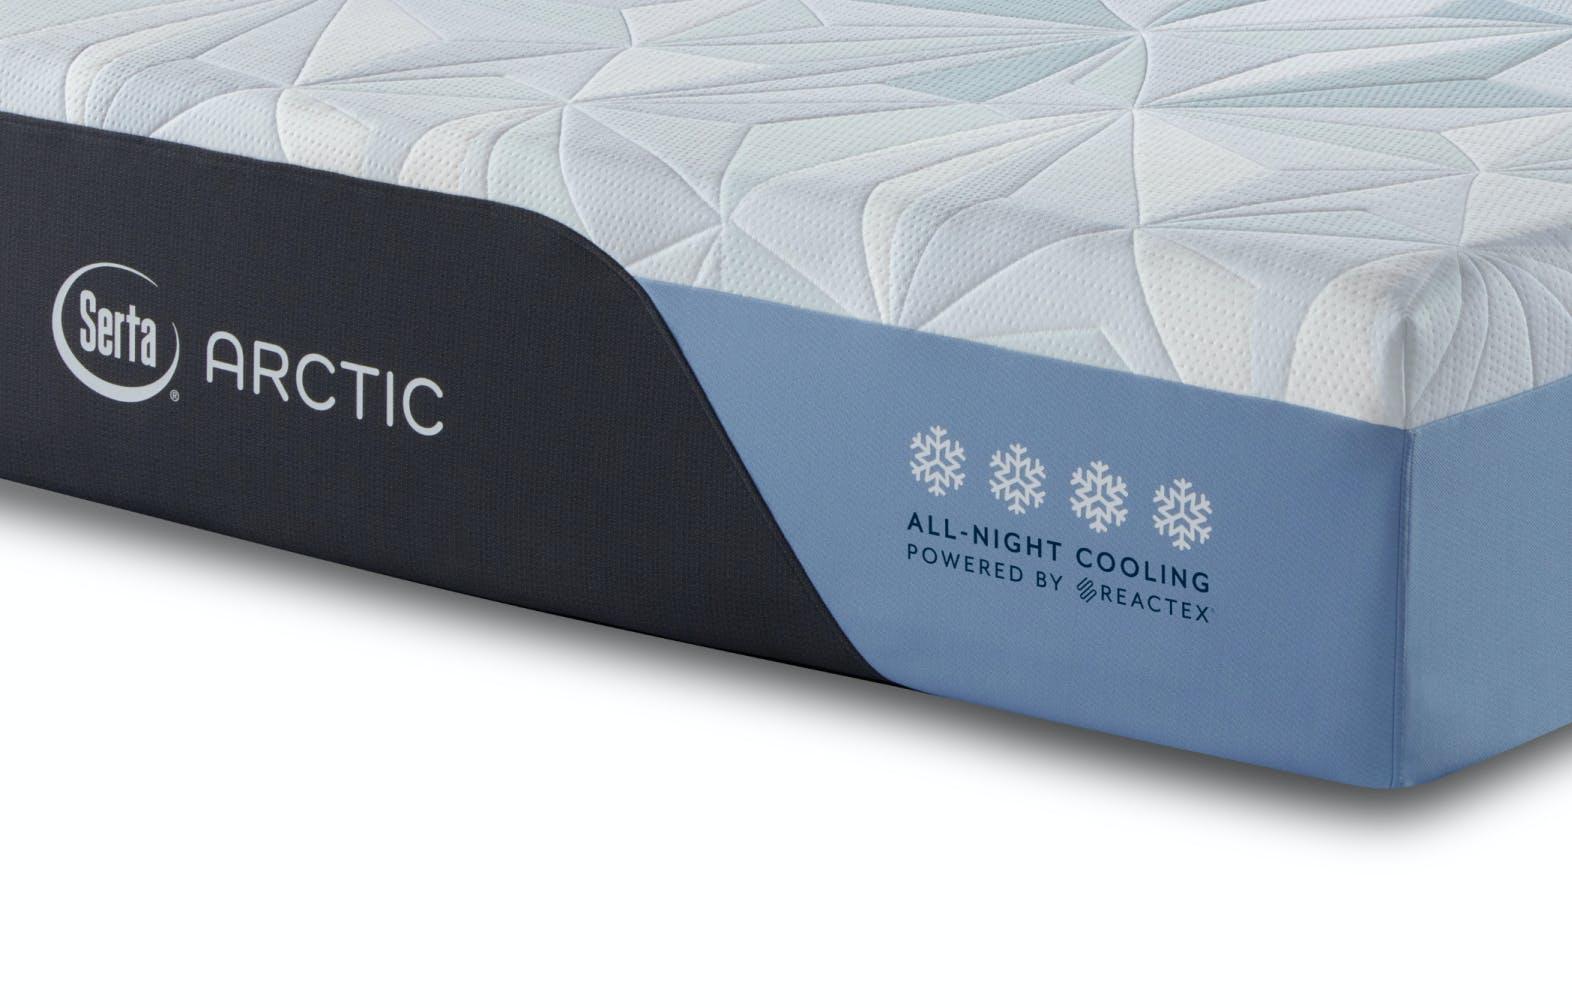 Foot of Serta Arctic Mattress